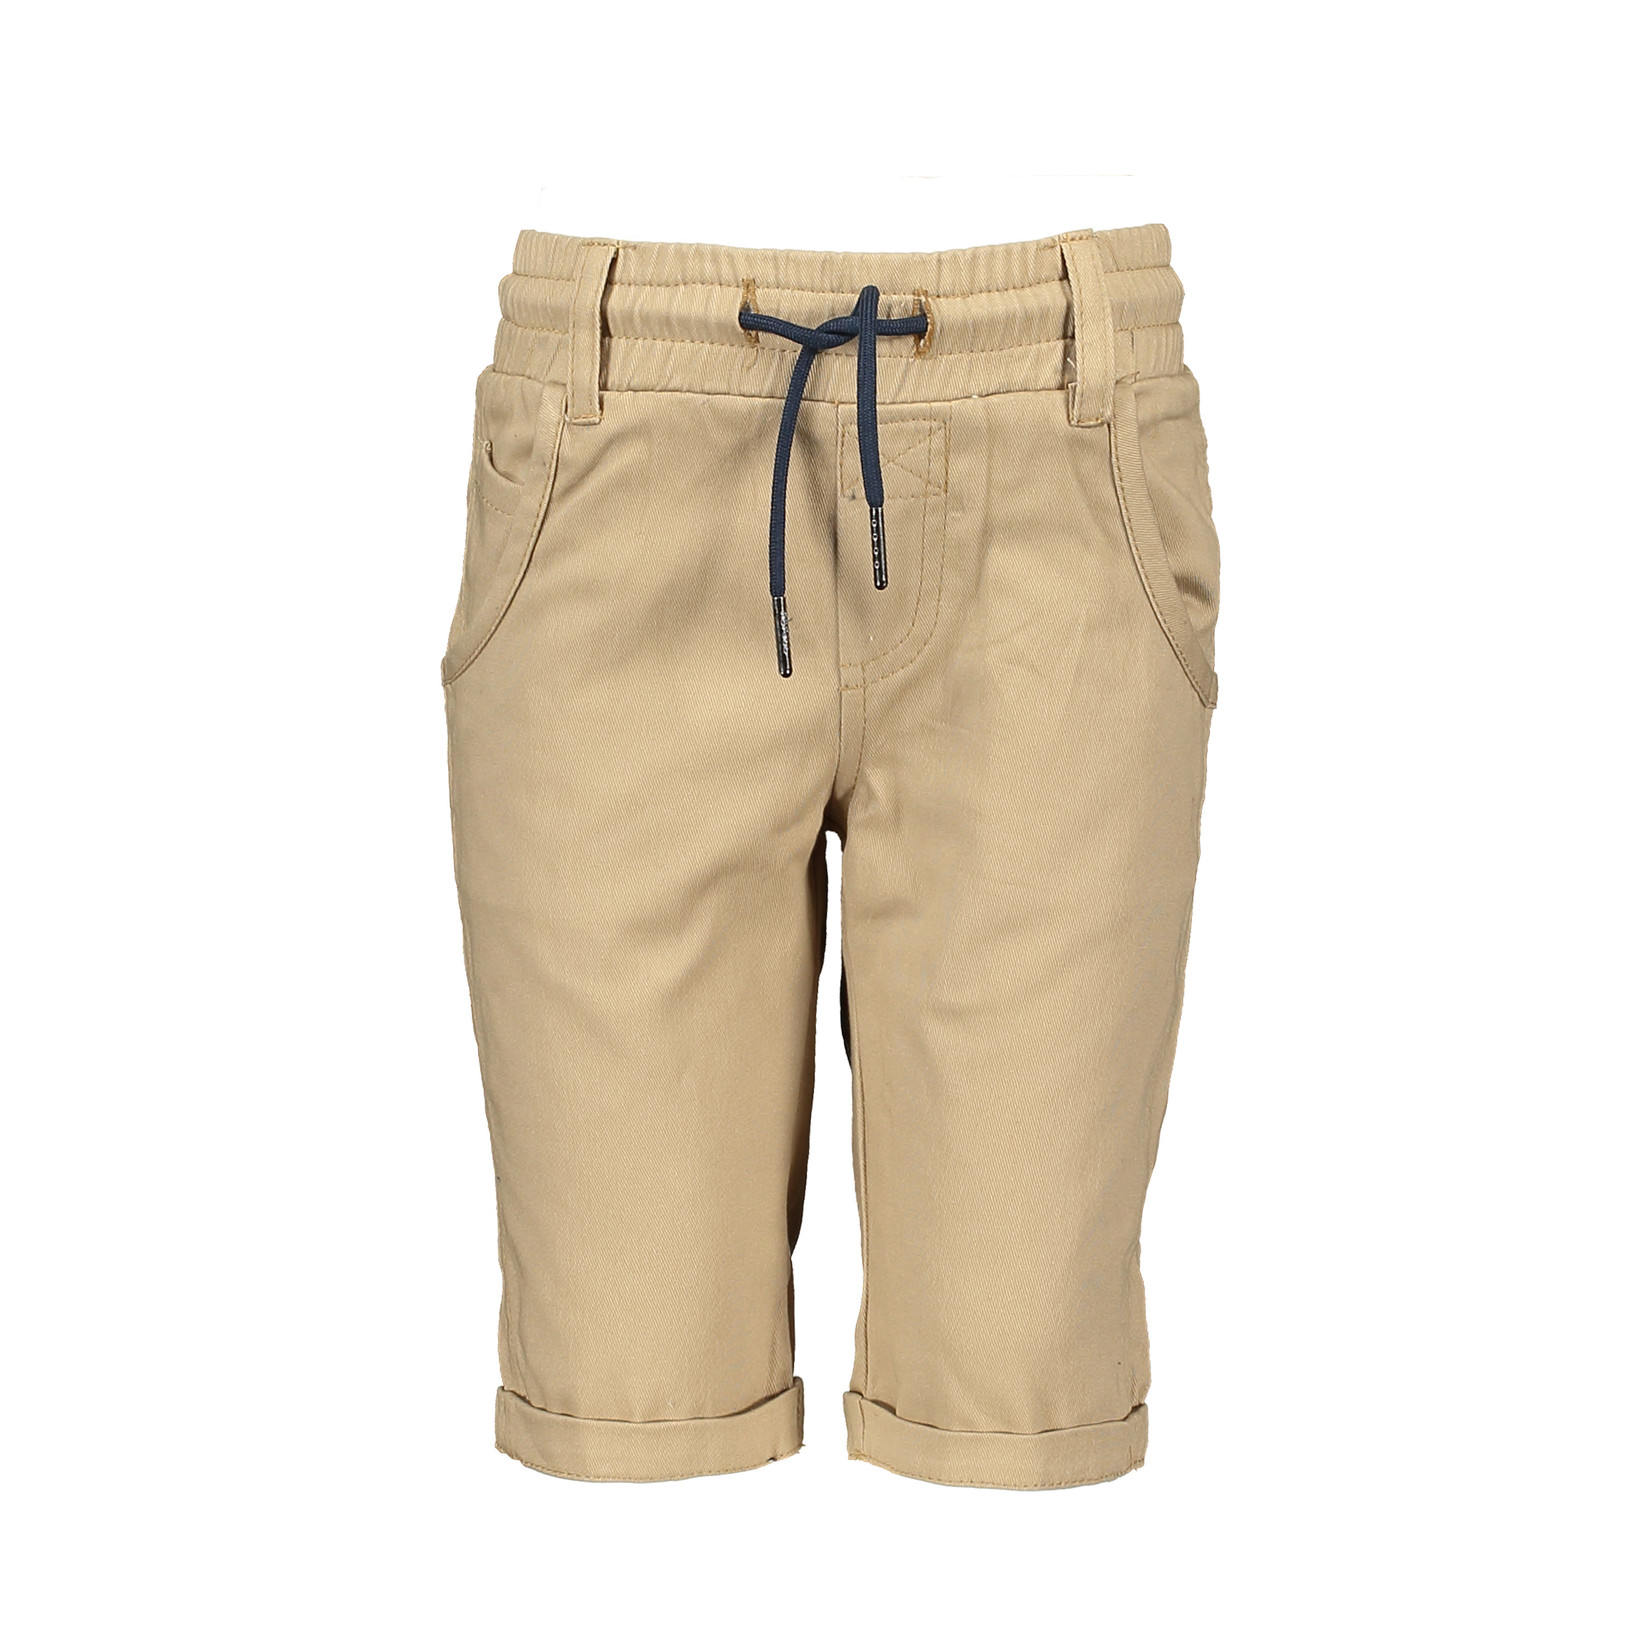 Bampidano Little Bampidano Boys woven shorts Dorian  with waistcord PLAY baby